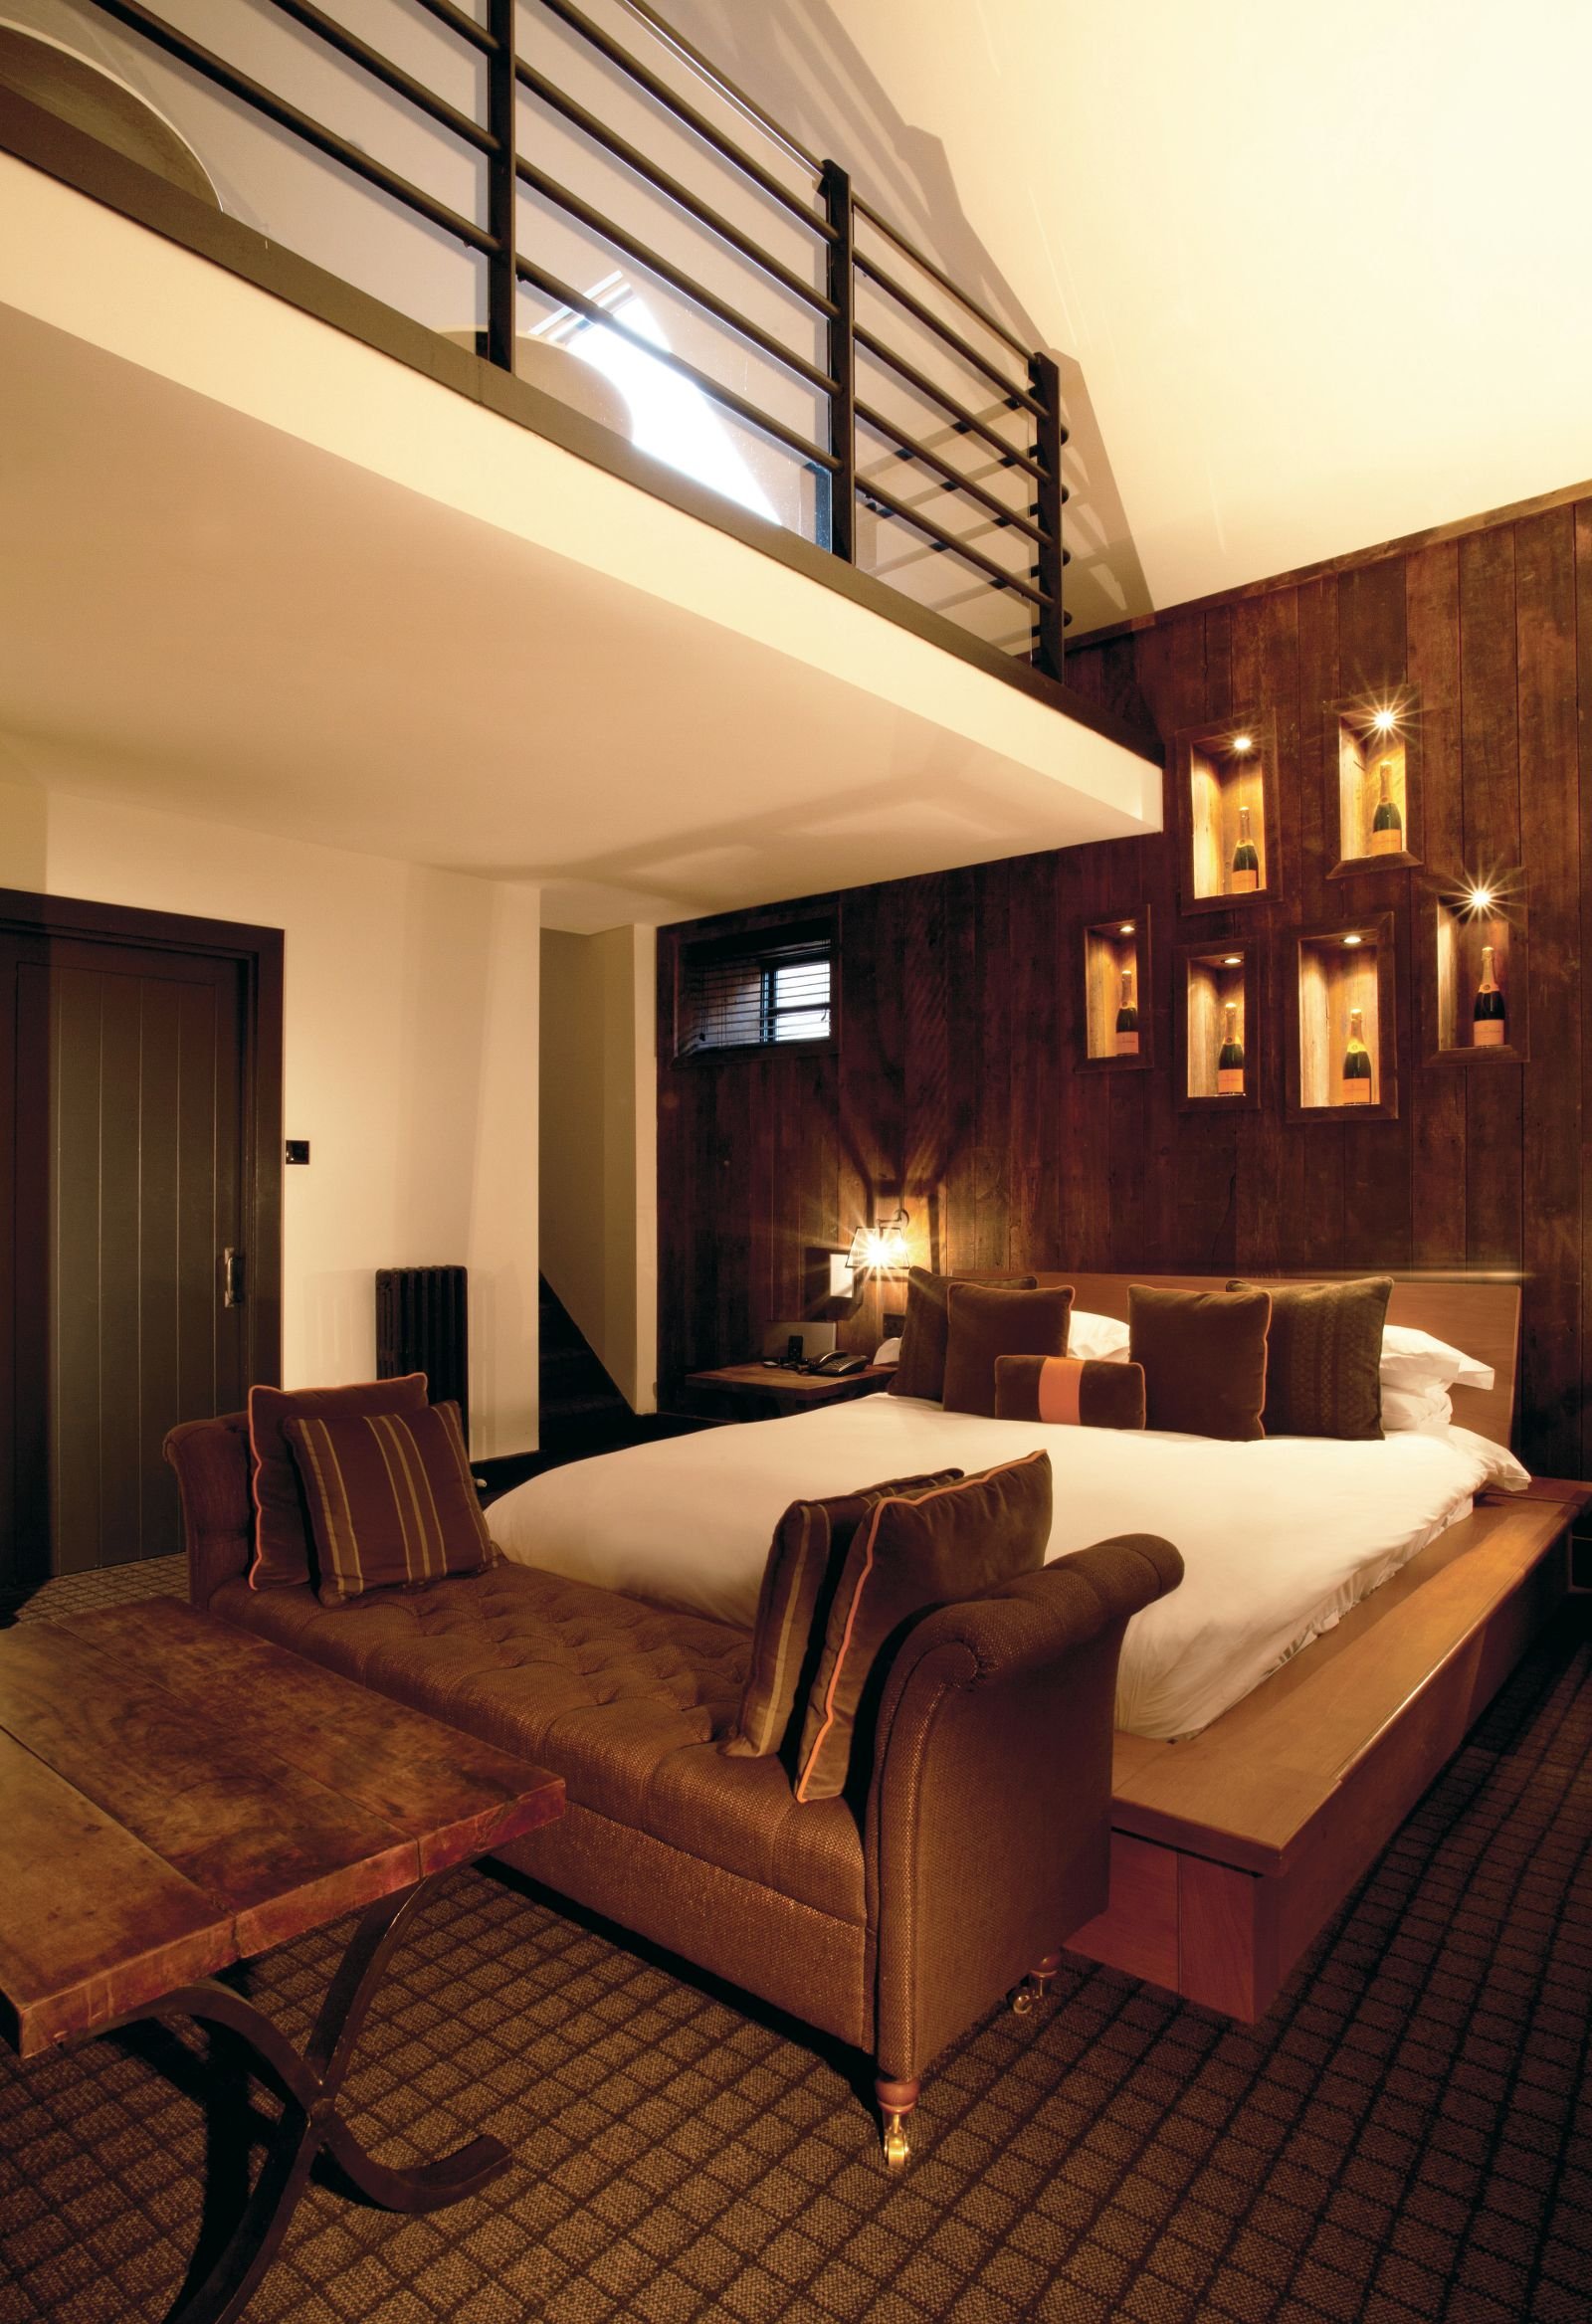 Avon grand opening Offer at Hotel Du Vin Hotel